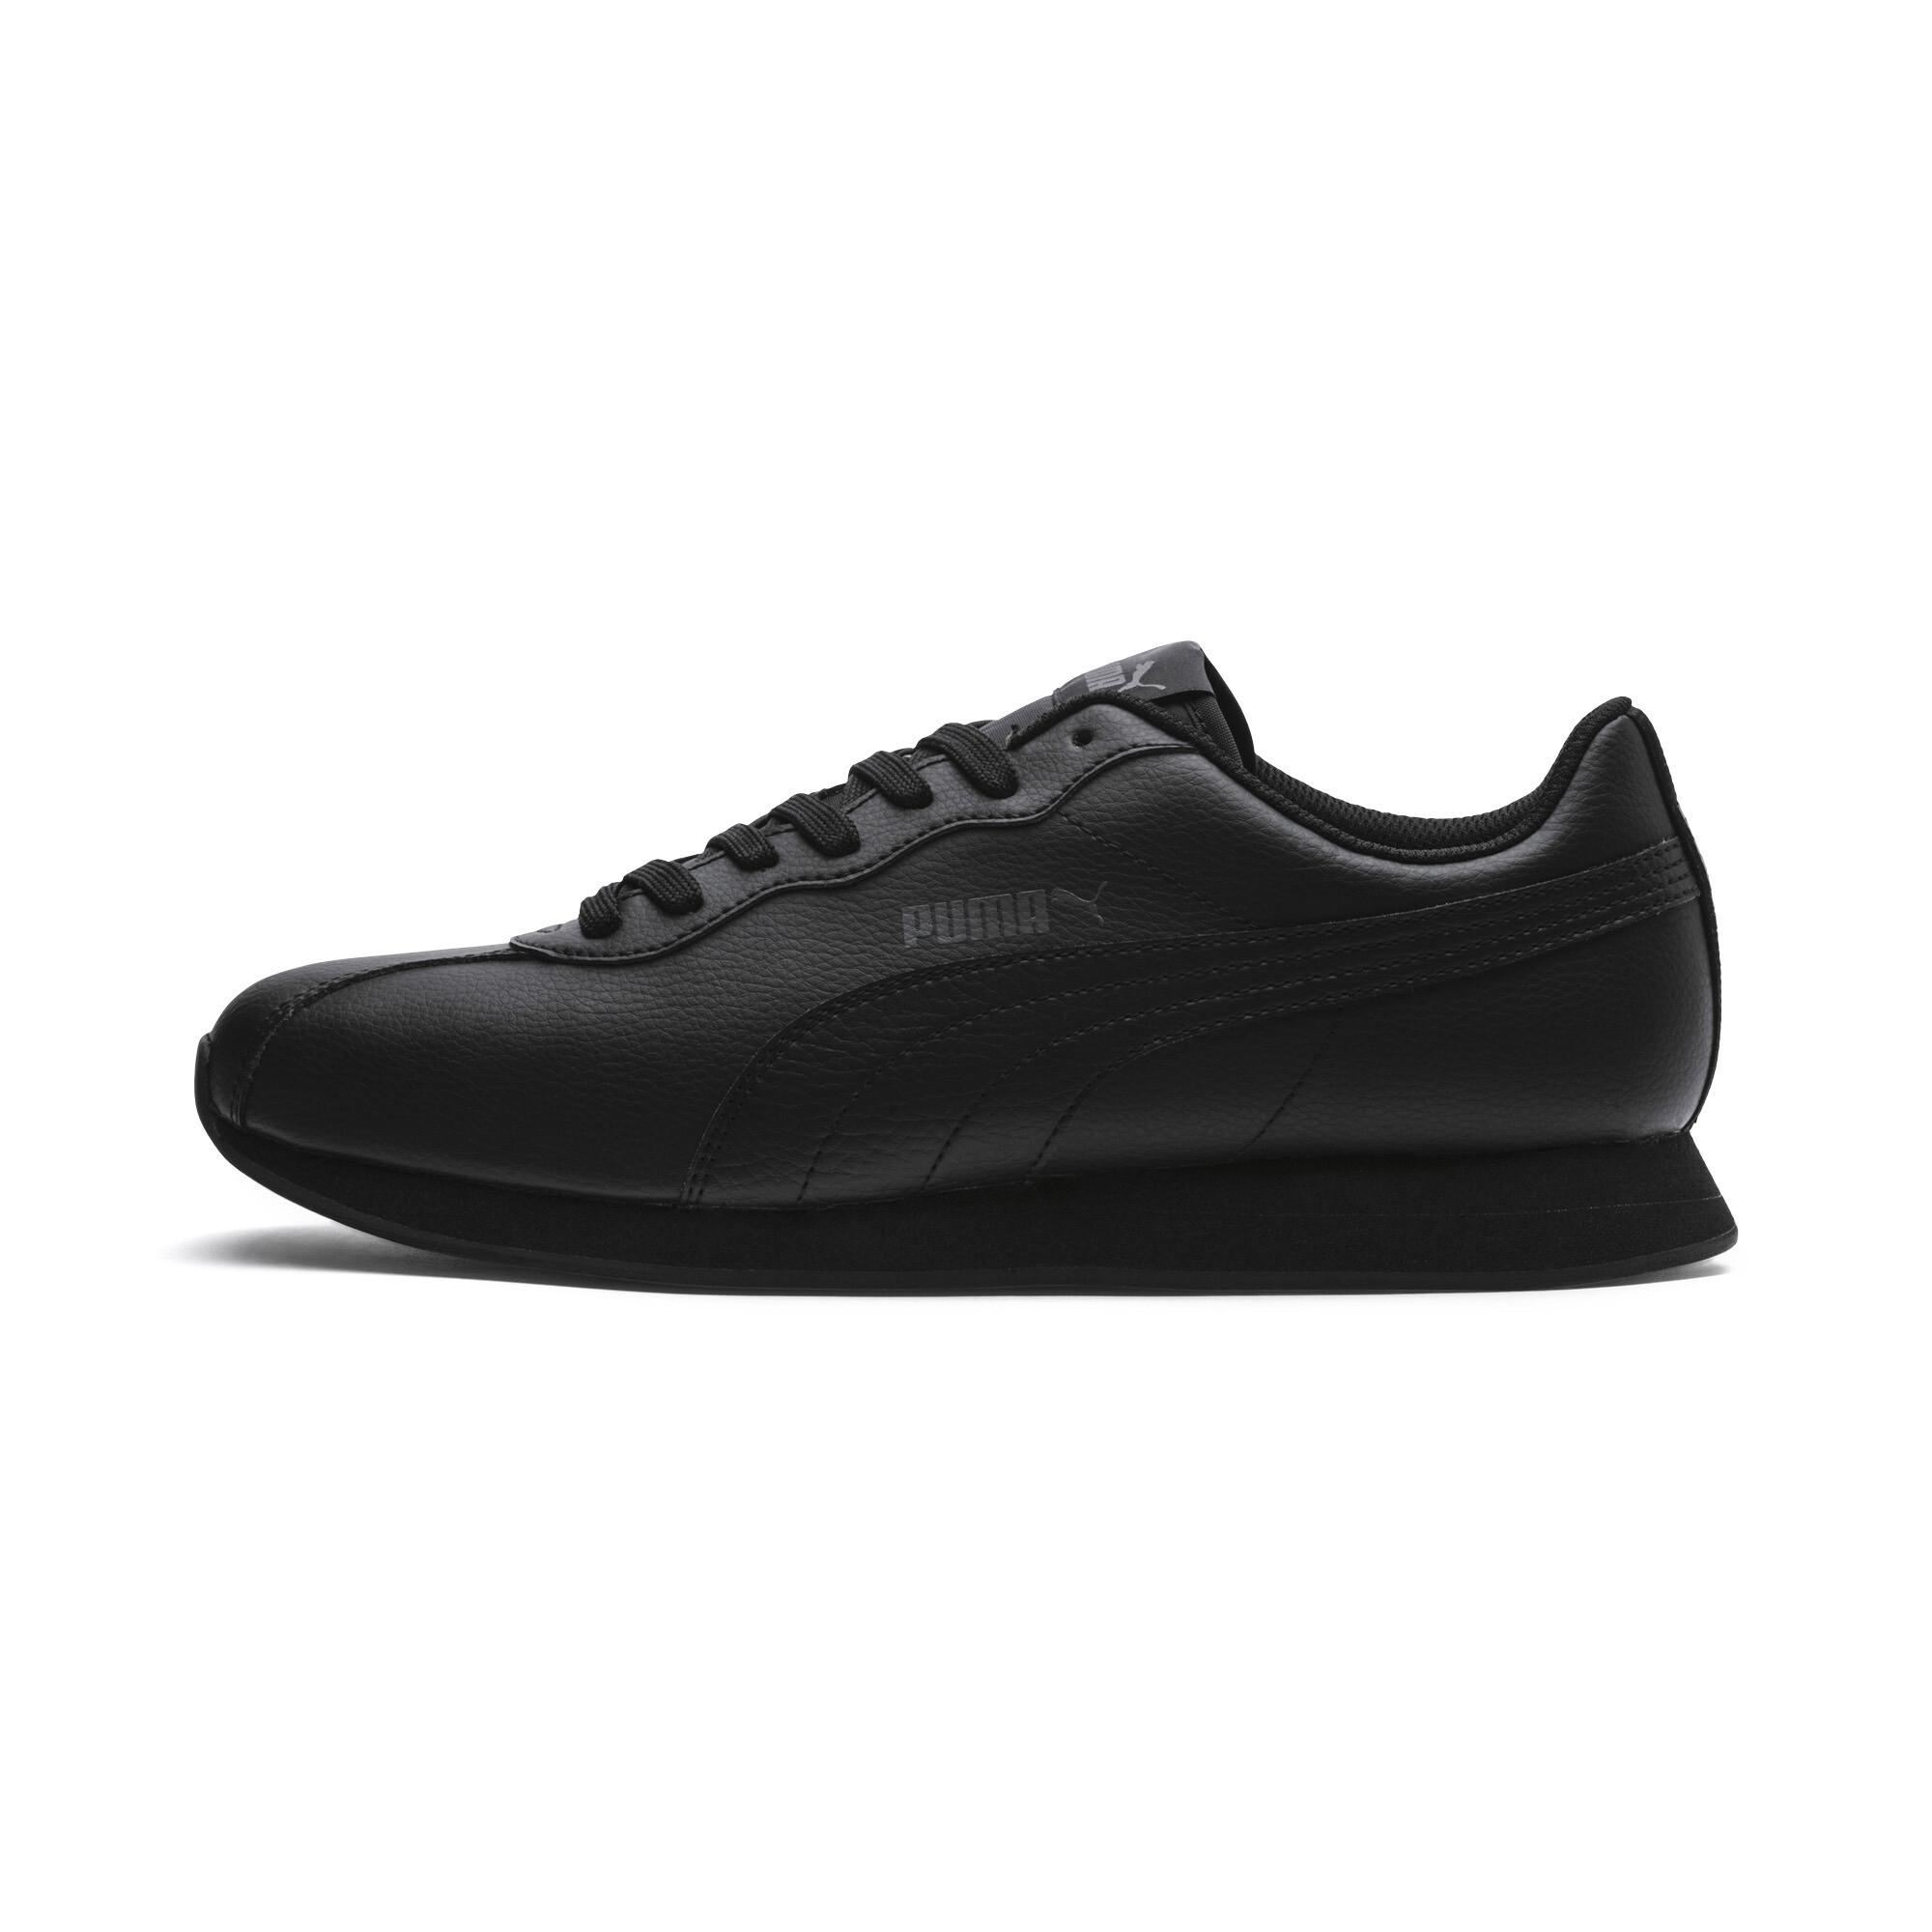 thumbnail 4 - PUMA Men's Turin II Sneakers